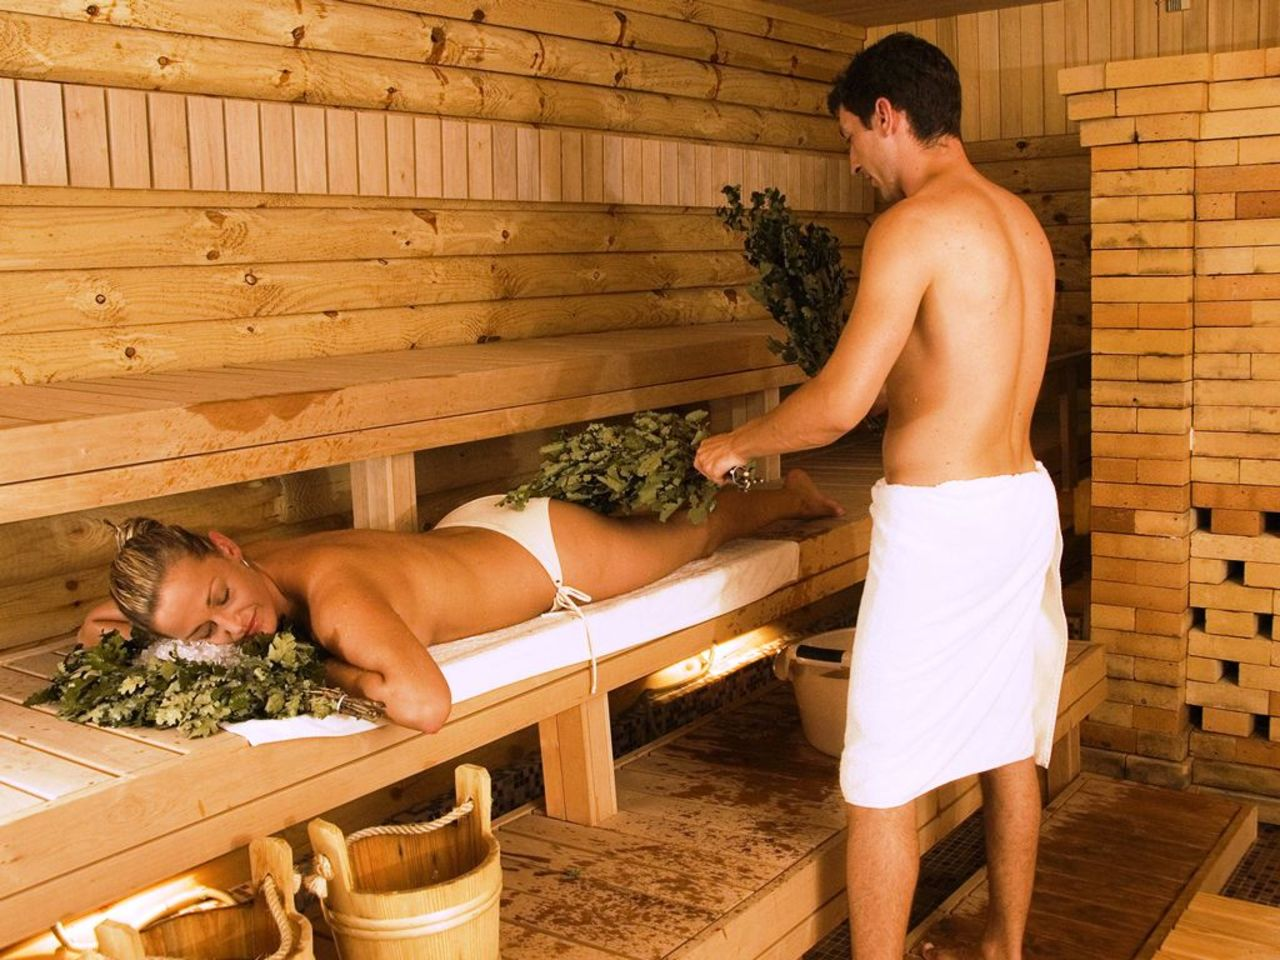 parni-v-saune-s-devkami